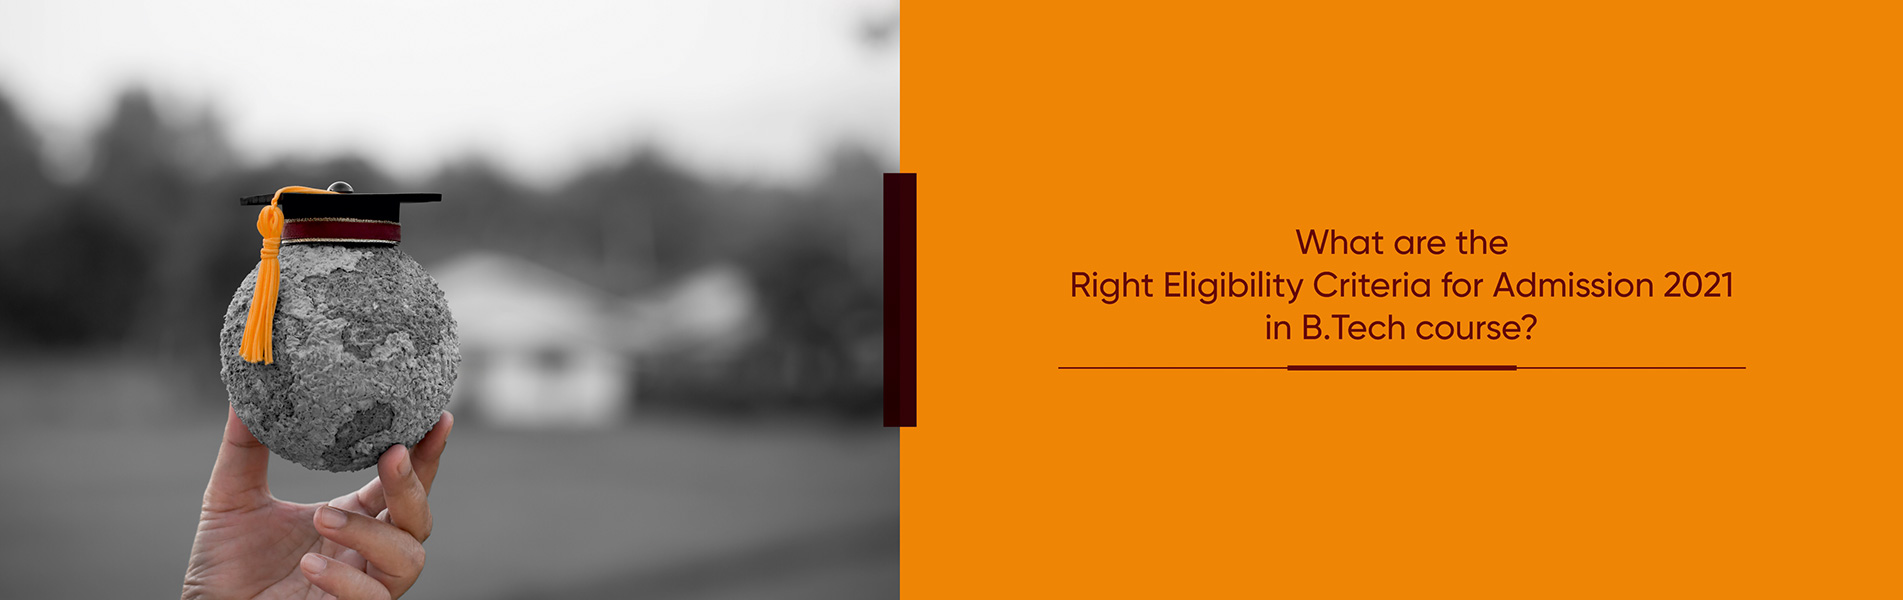 eligibility criteria, admission 2021, BTech course